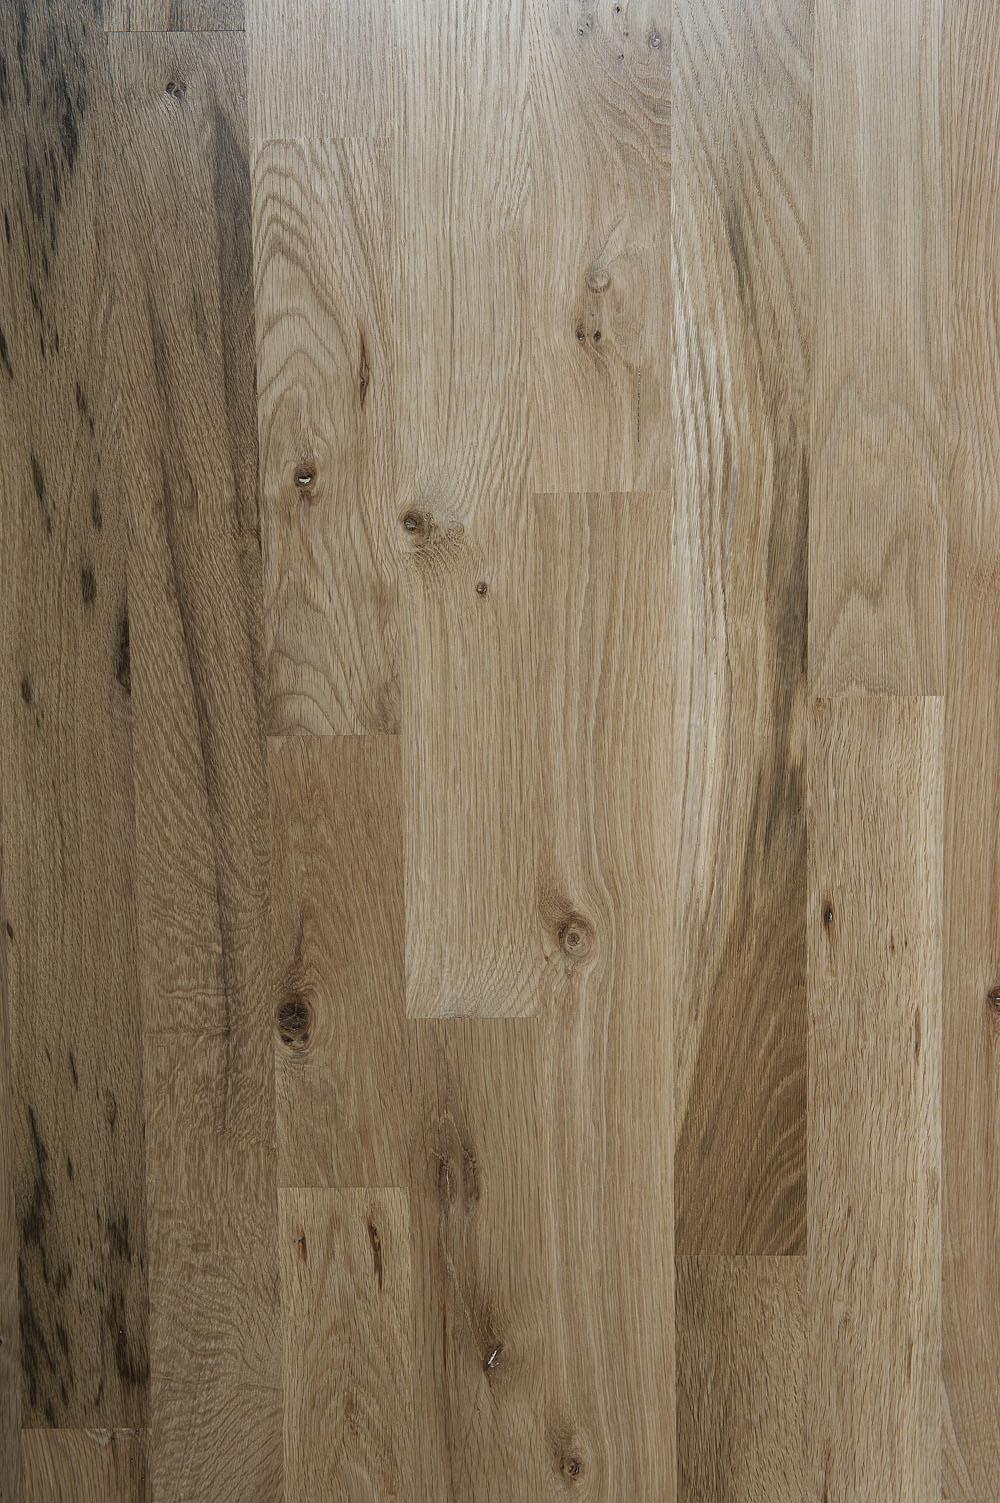 White Oak Unfinished Hardwood Flooring Gurus Floor